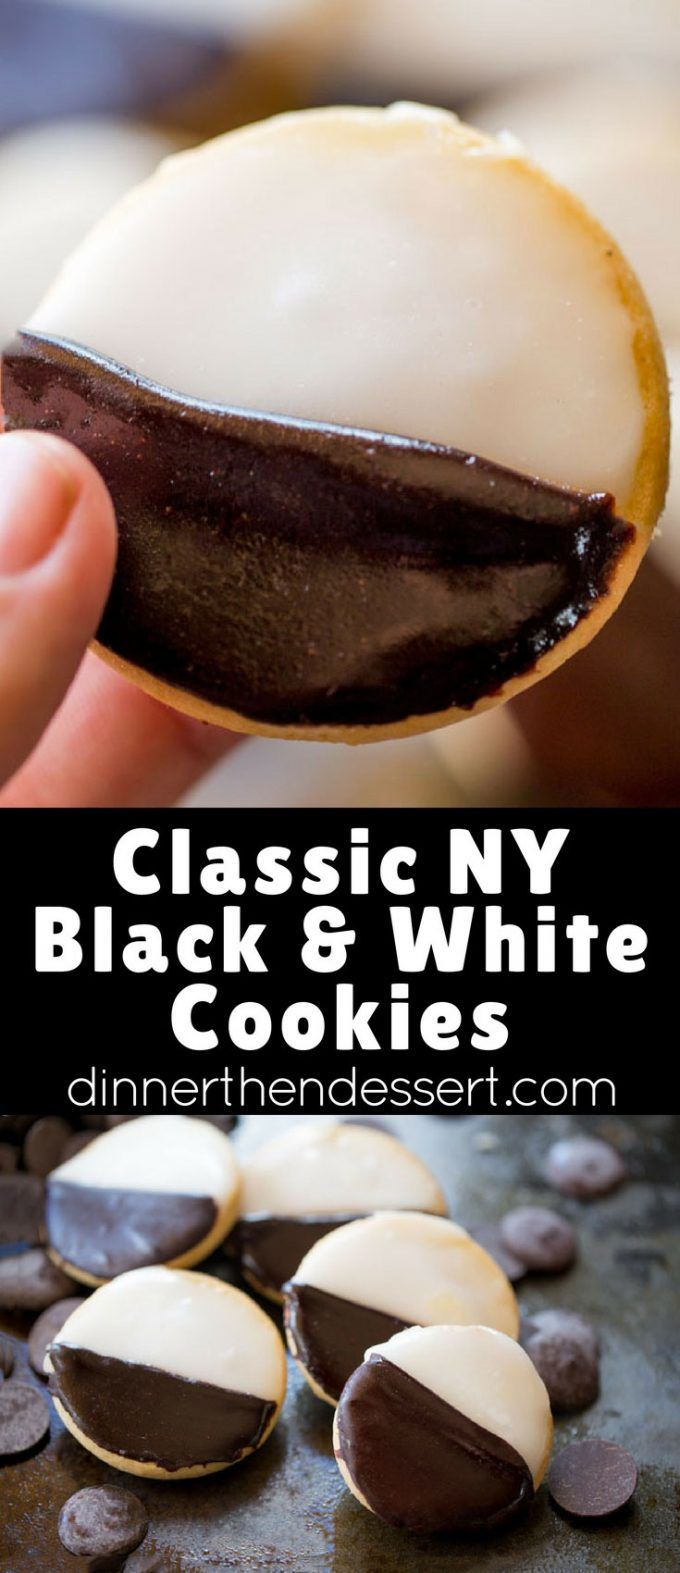 cookies dinnerthendessert authentic recipe cookie nyc recipes those dessert dinner